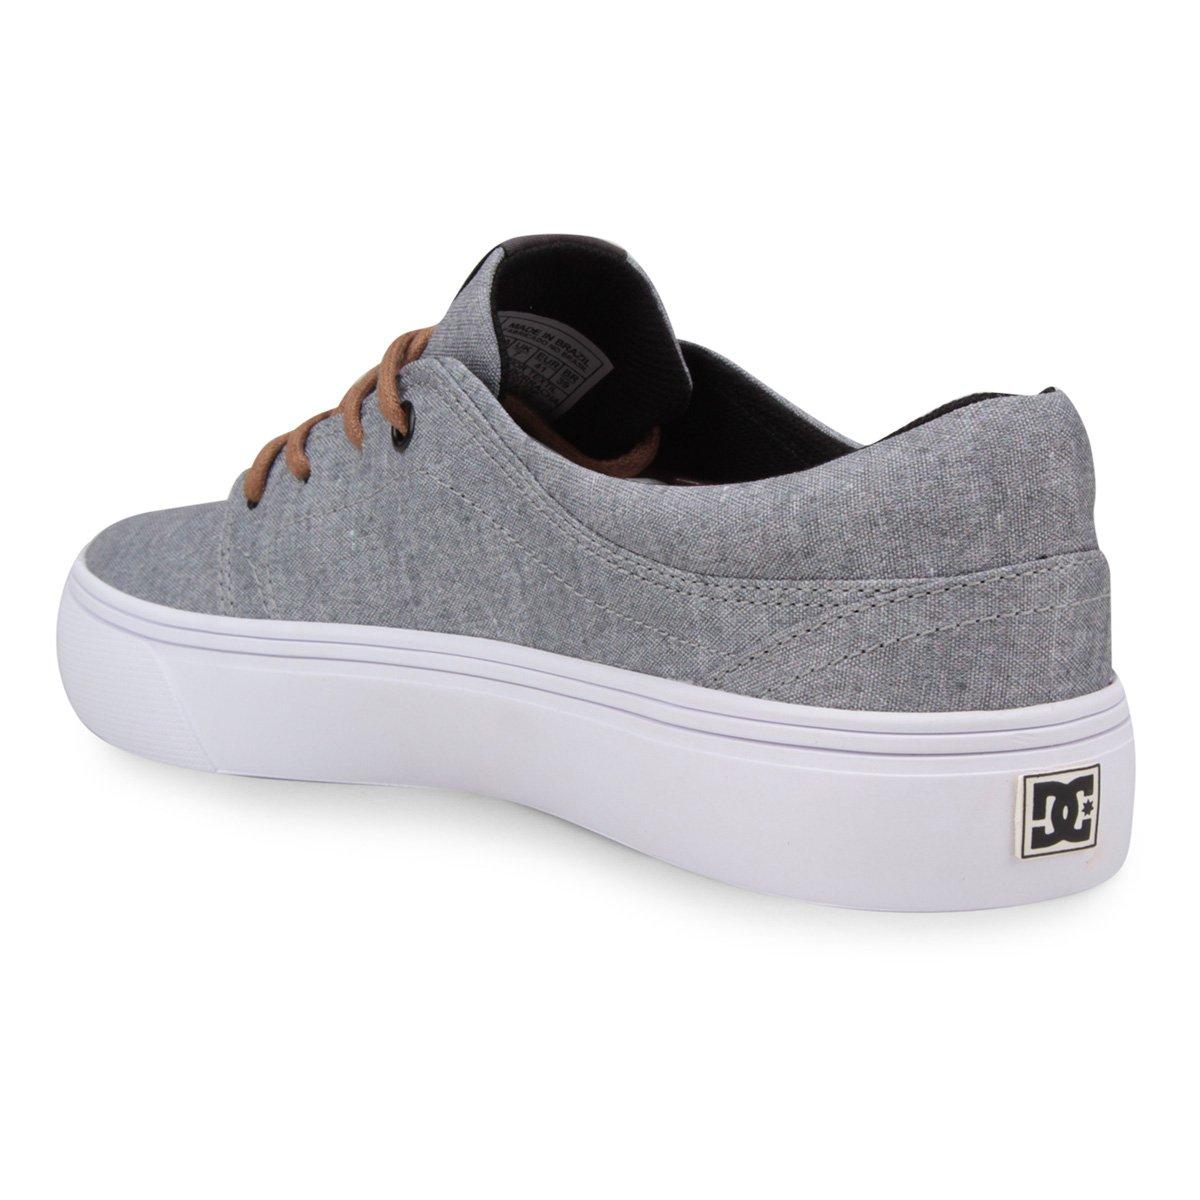 Tênis DC Shoes Trase Tx Se Masculino - Cinza - Compre Agora  56a1ac1125a0e